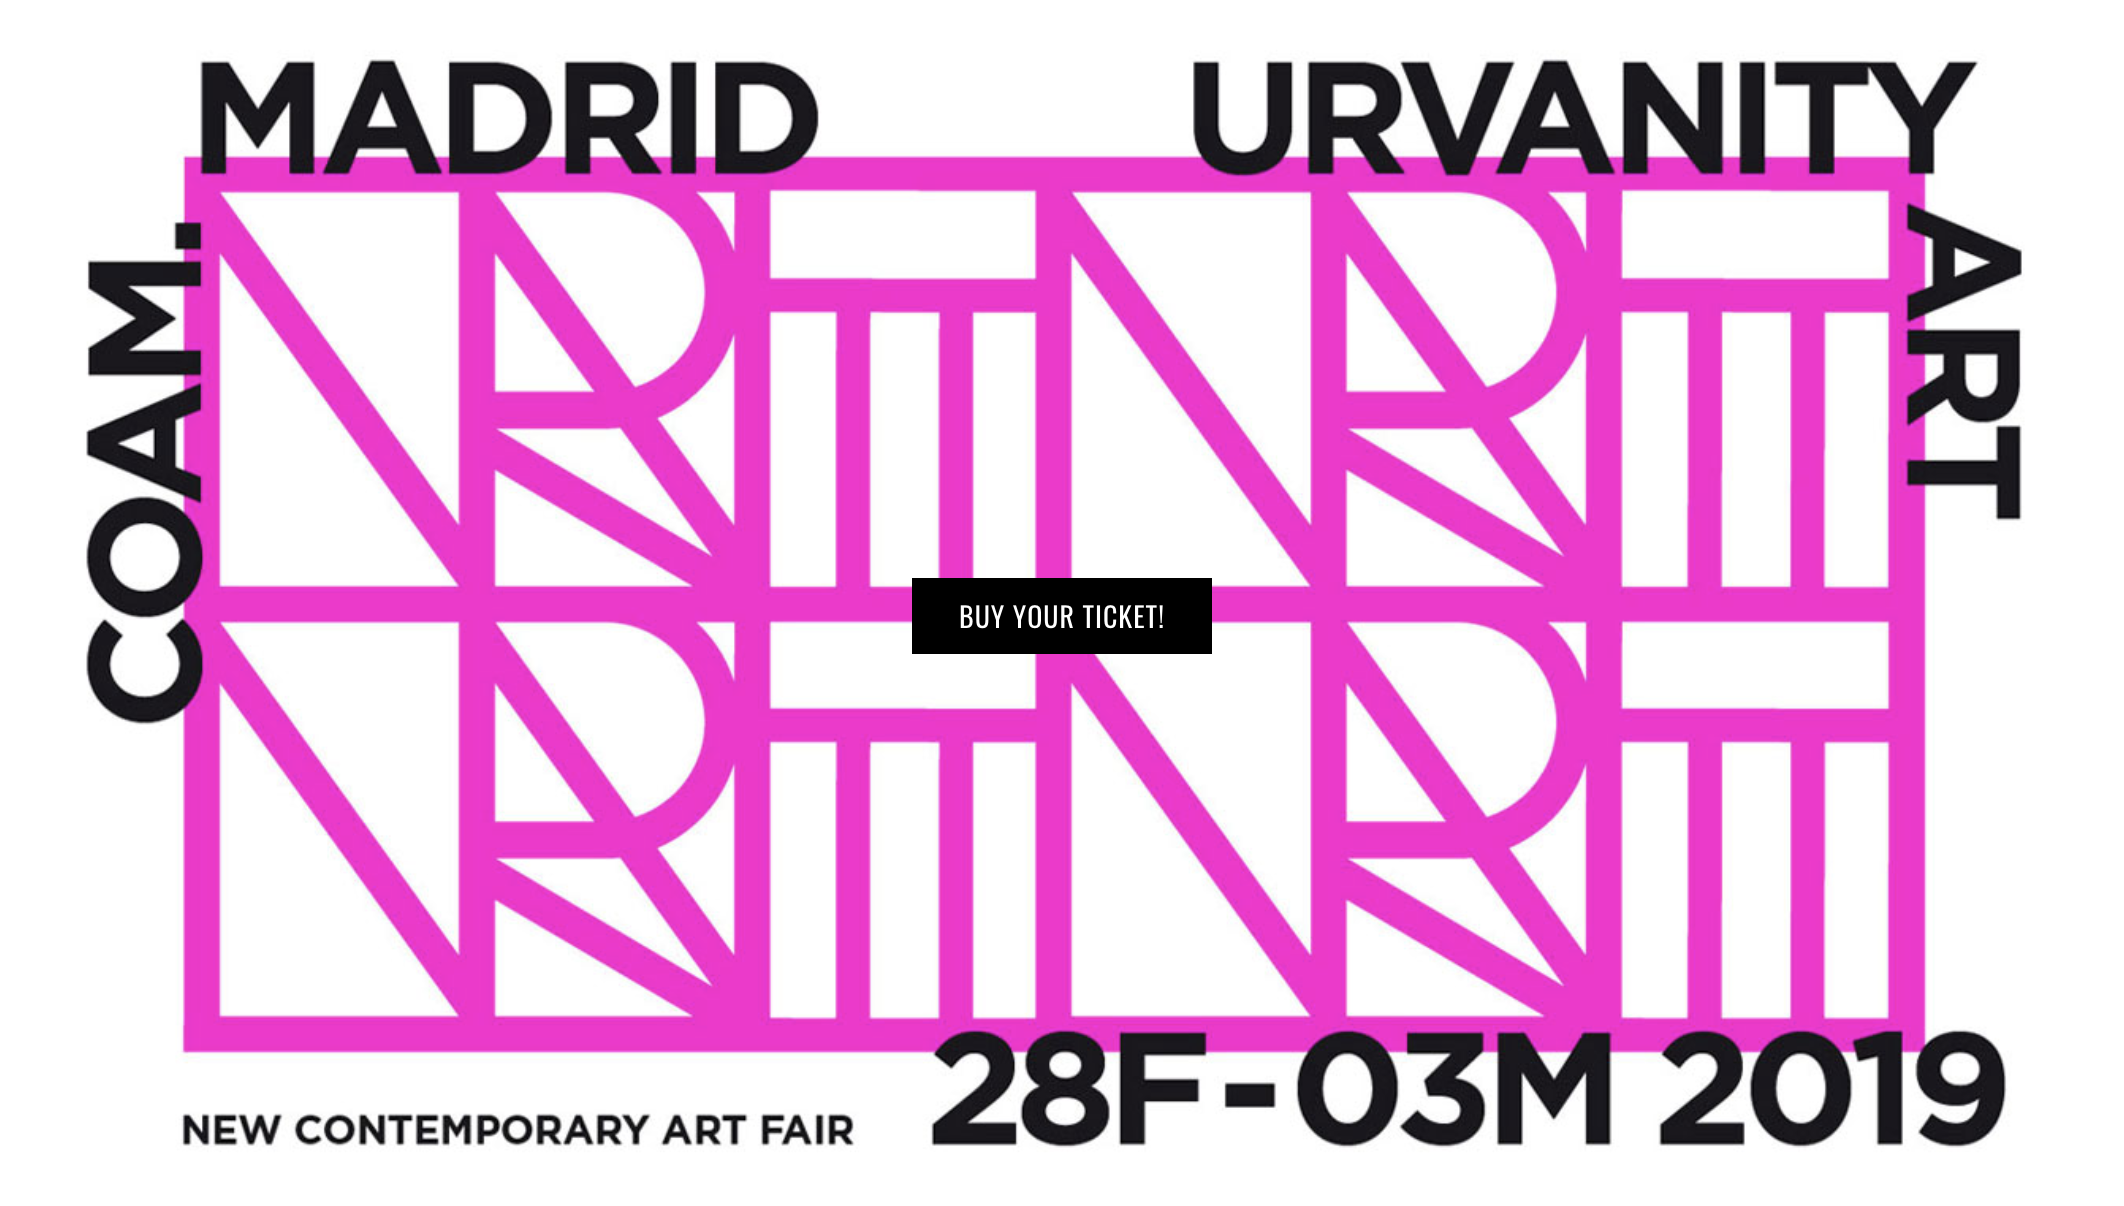 urvanity art 2019